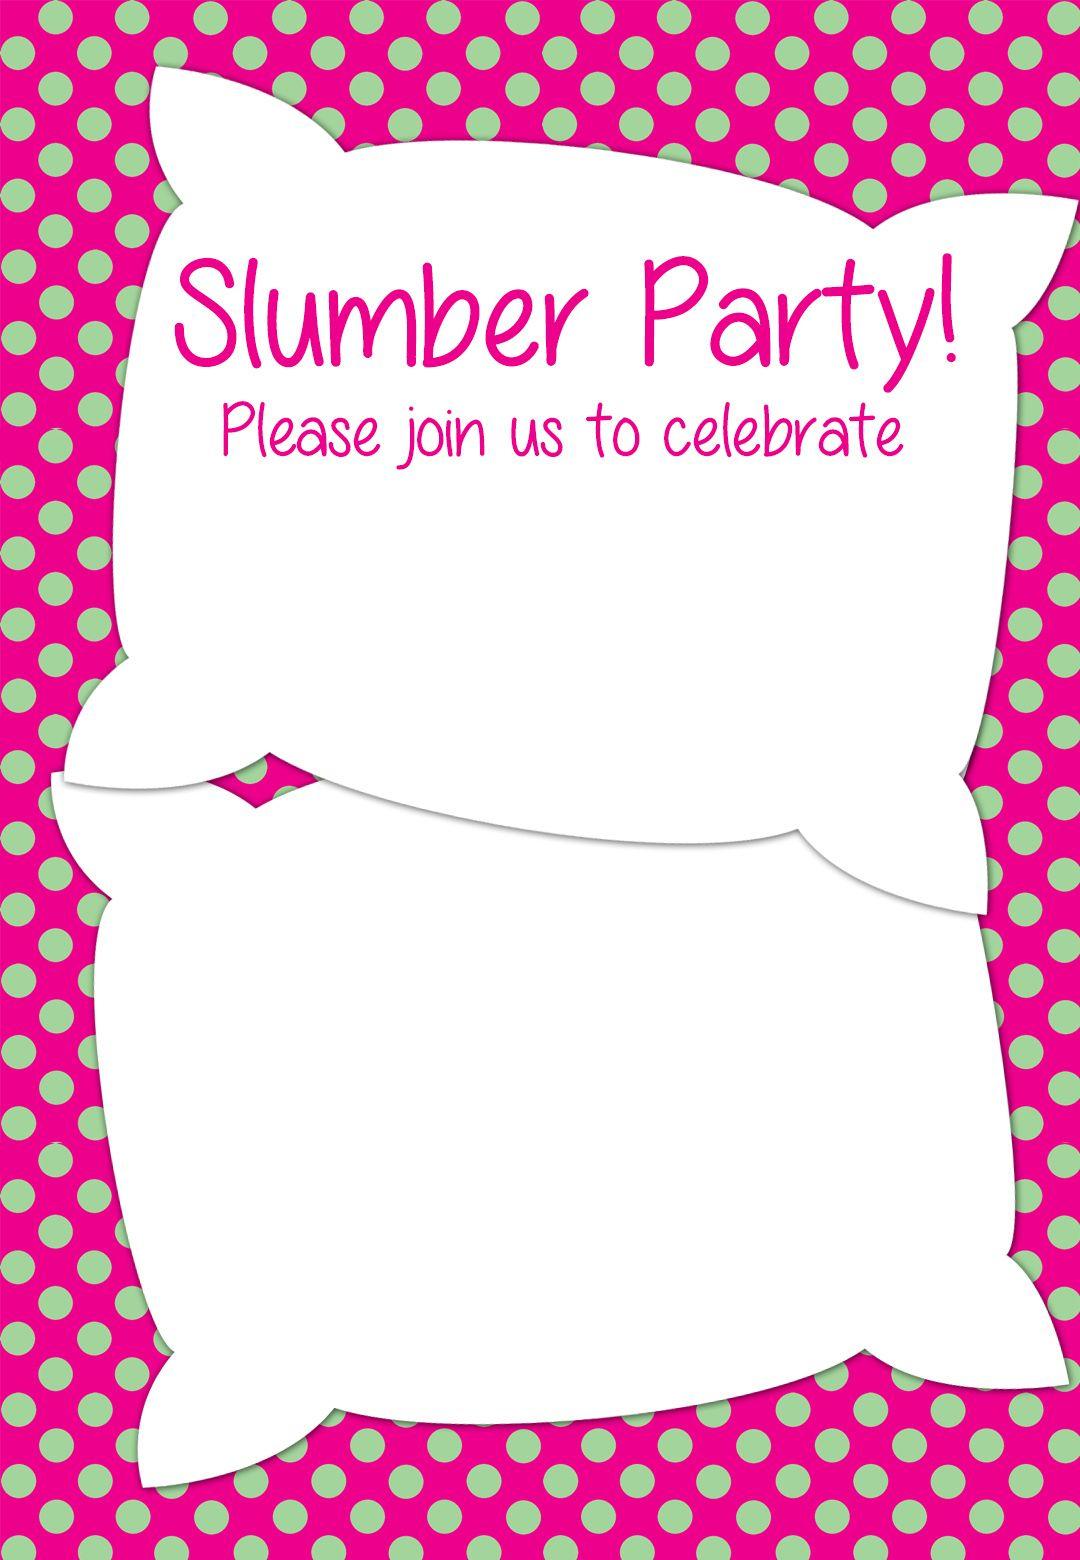 Free Printable Slumber Party Invitation | Party Ideas In 2019 - Free Printable Polka Dot Birthday Party Invitations